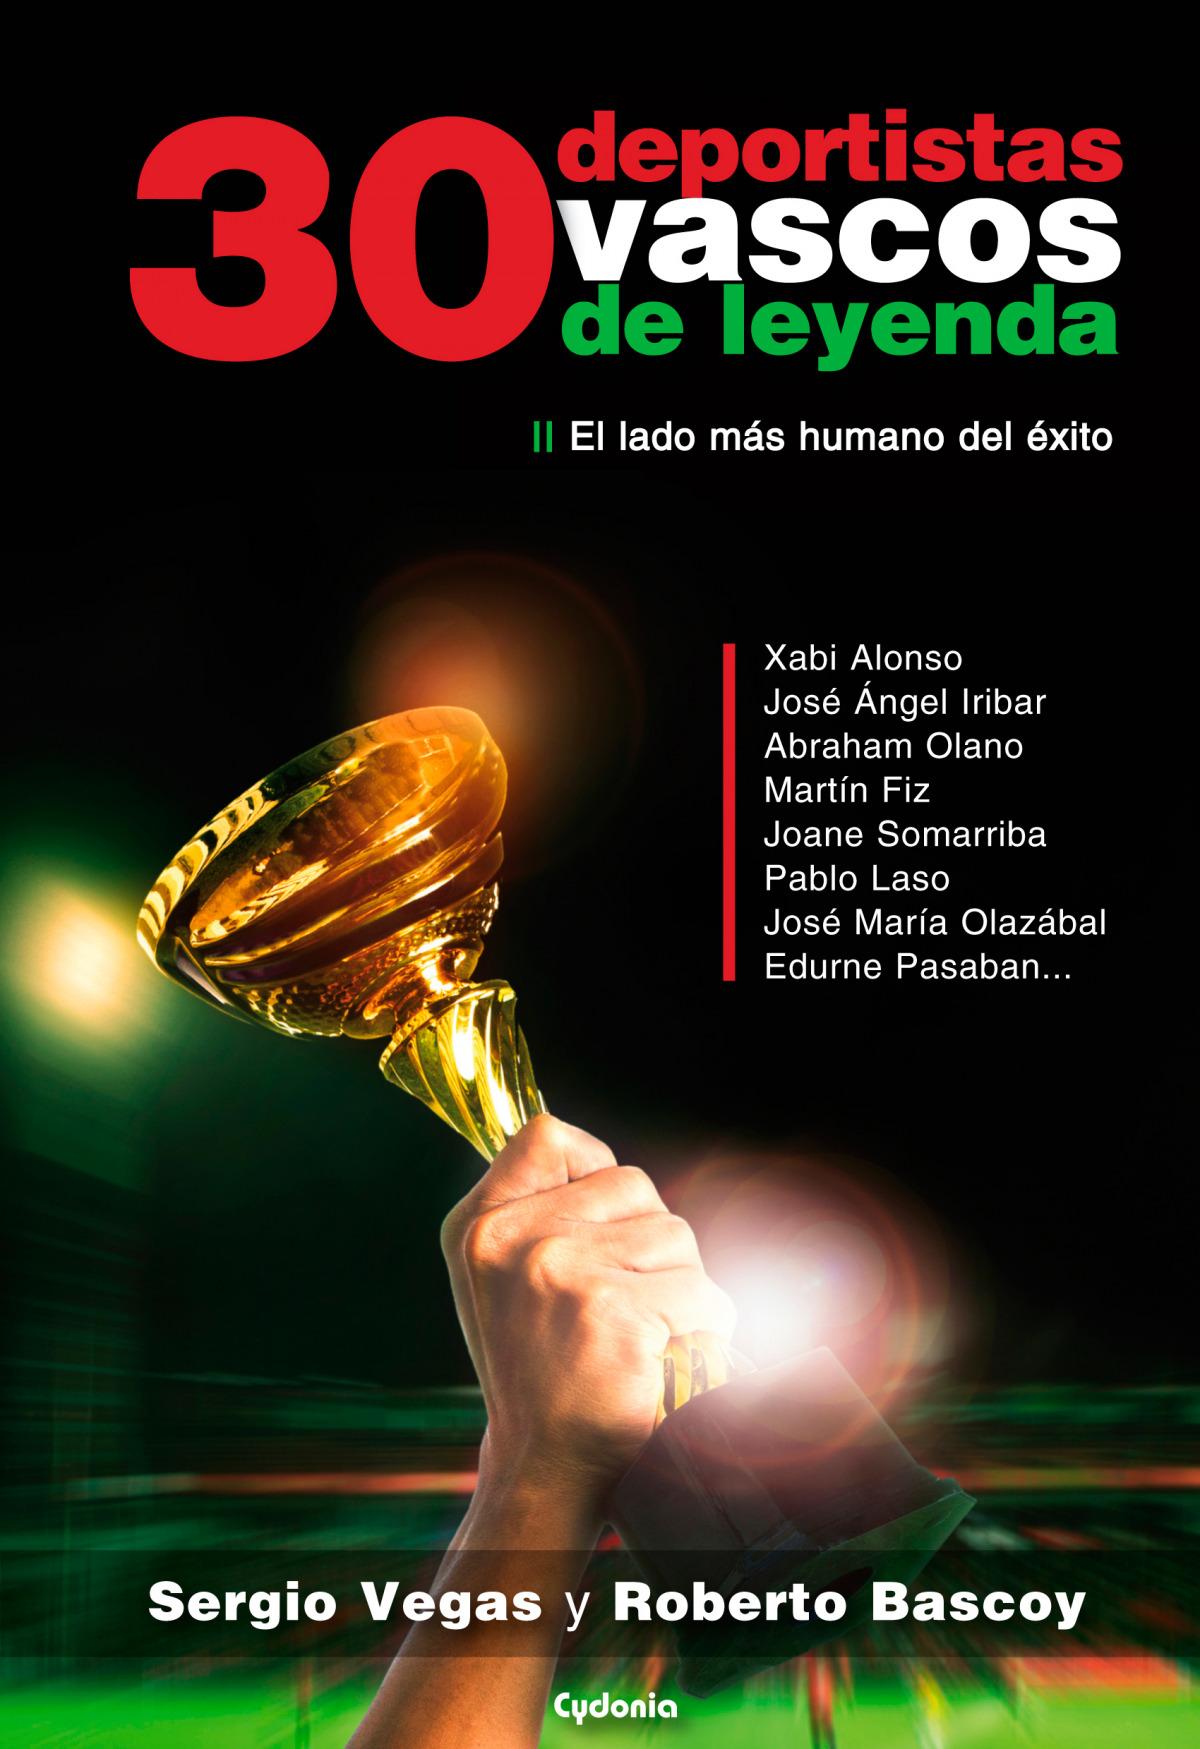 30 deportistas vascos de leyenda 9788494508455